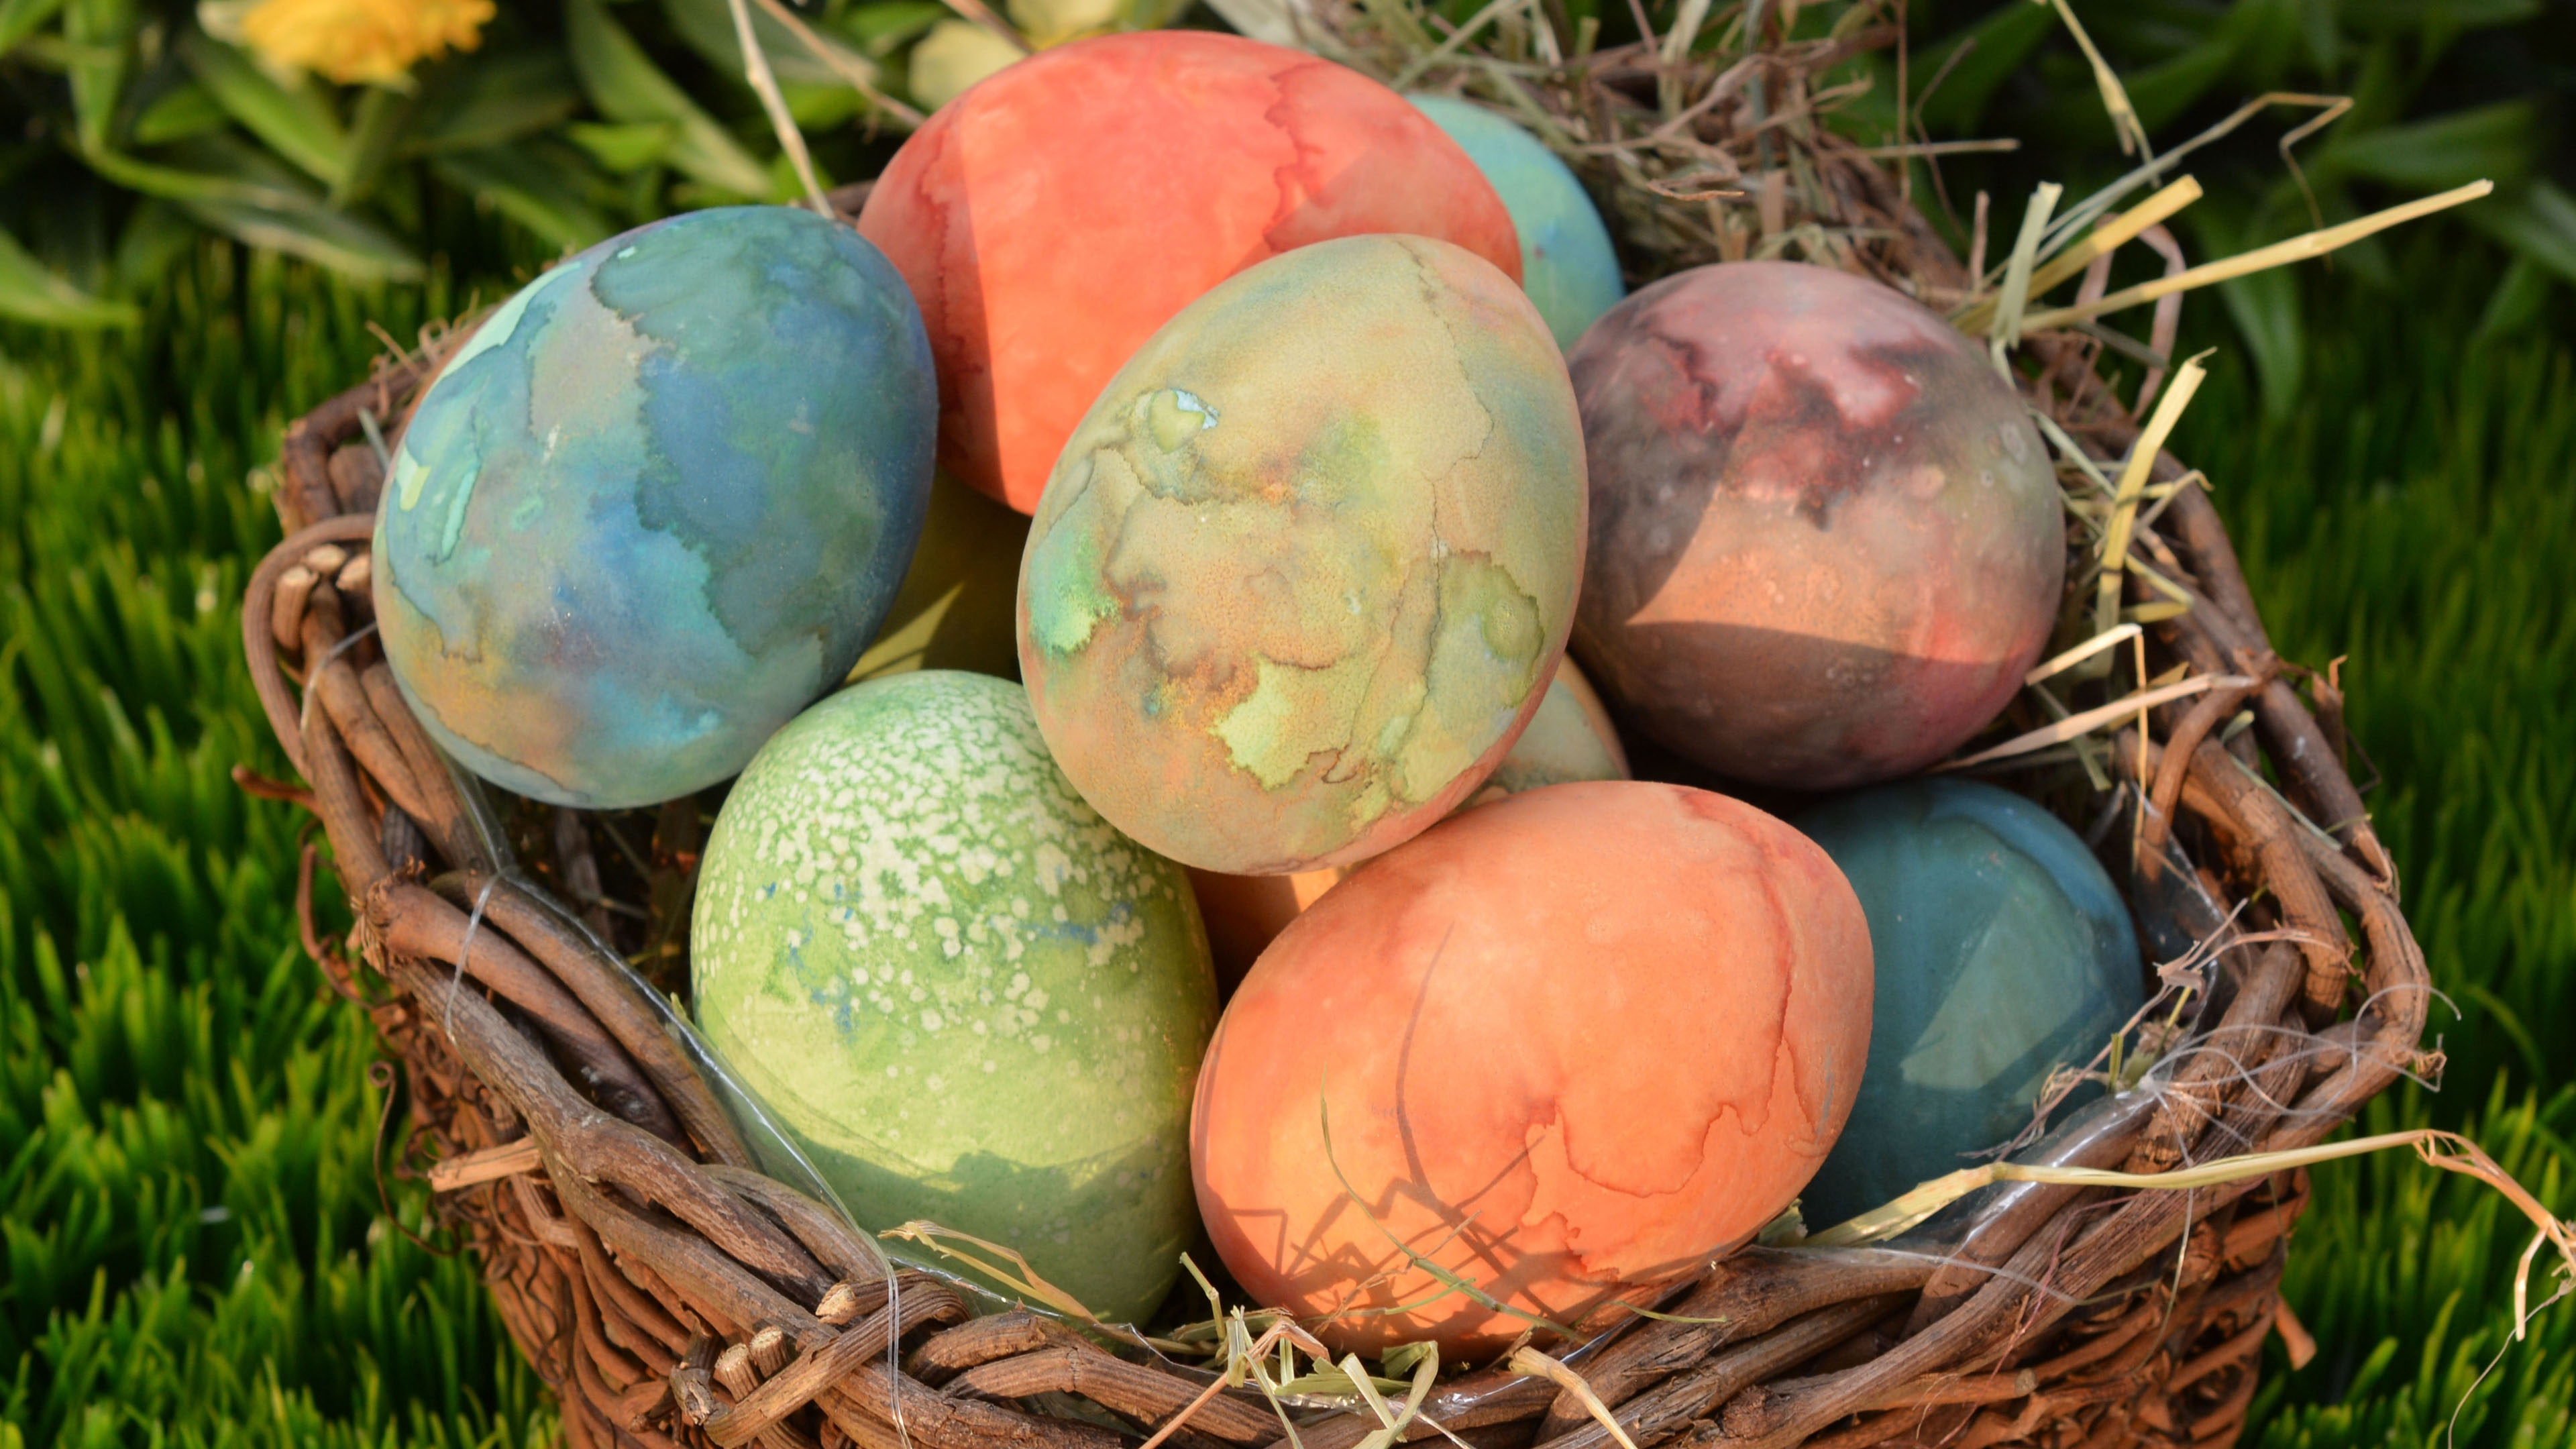 easter eggs easter eggs basket 4k 1538344862 - easter eggs, easter, eggs, basket 4k - Eggs, easter eggs, Easter